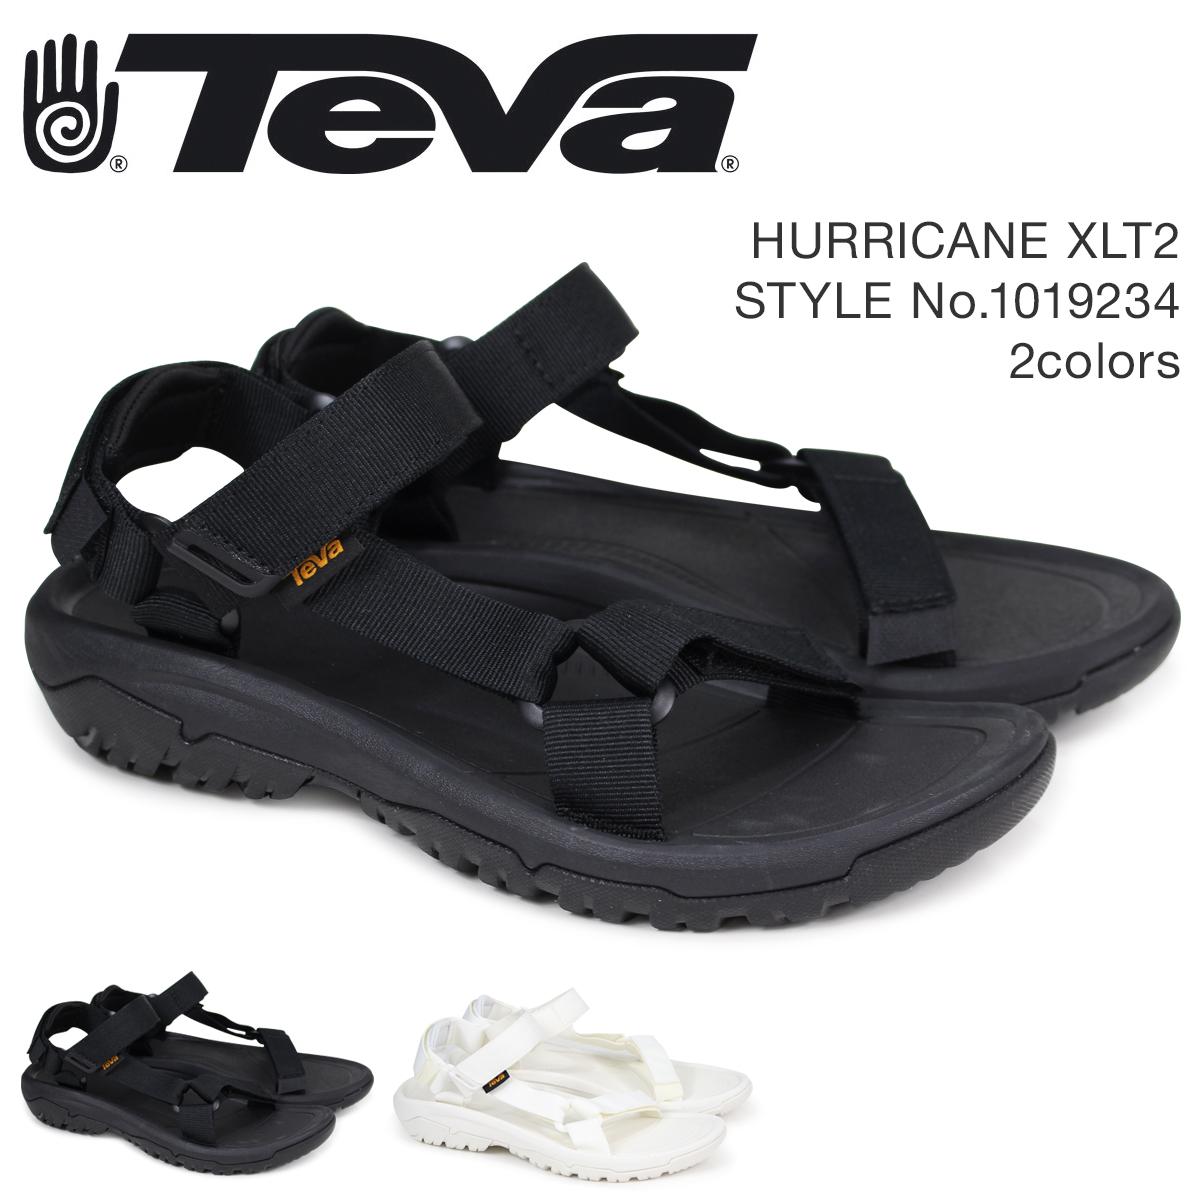 Teva テバ サンダル メンズ ハリケーン XLT2 HURRICANE ブラック ホワイト 1019234